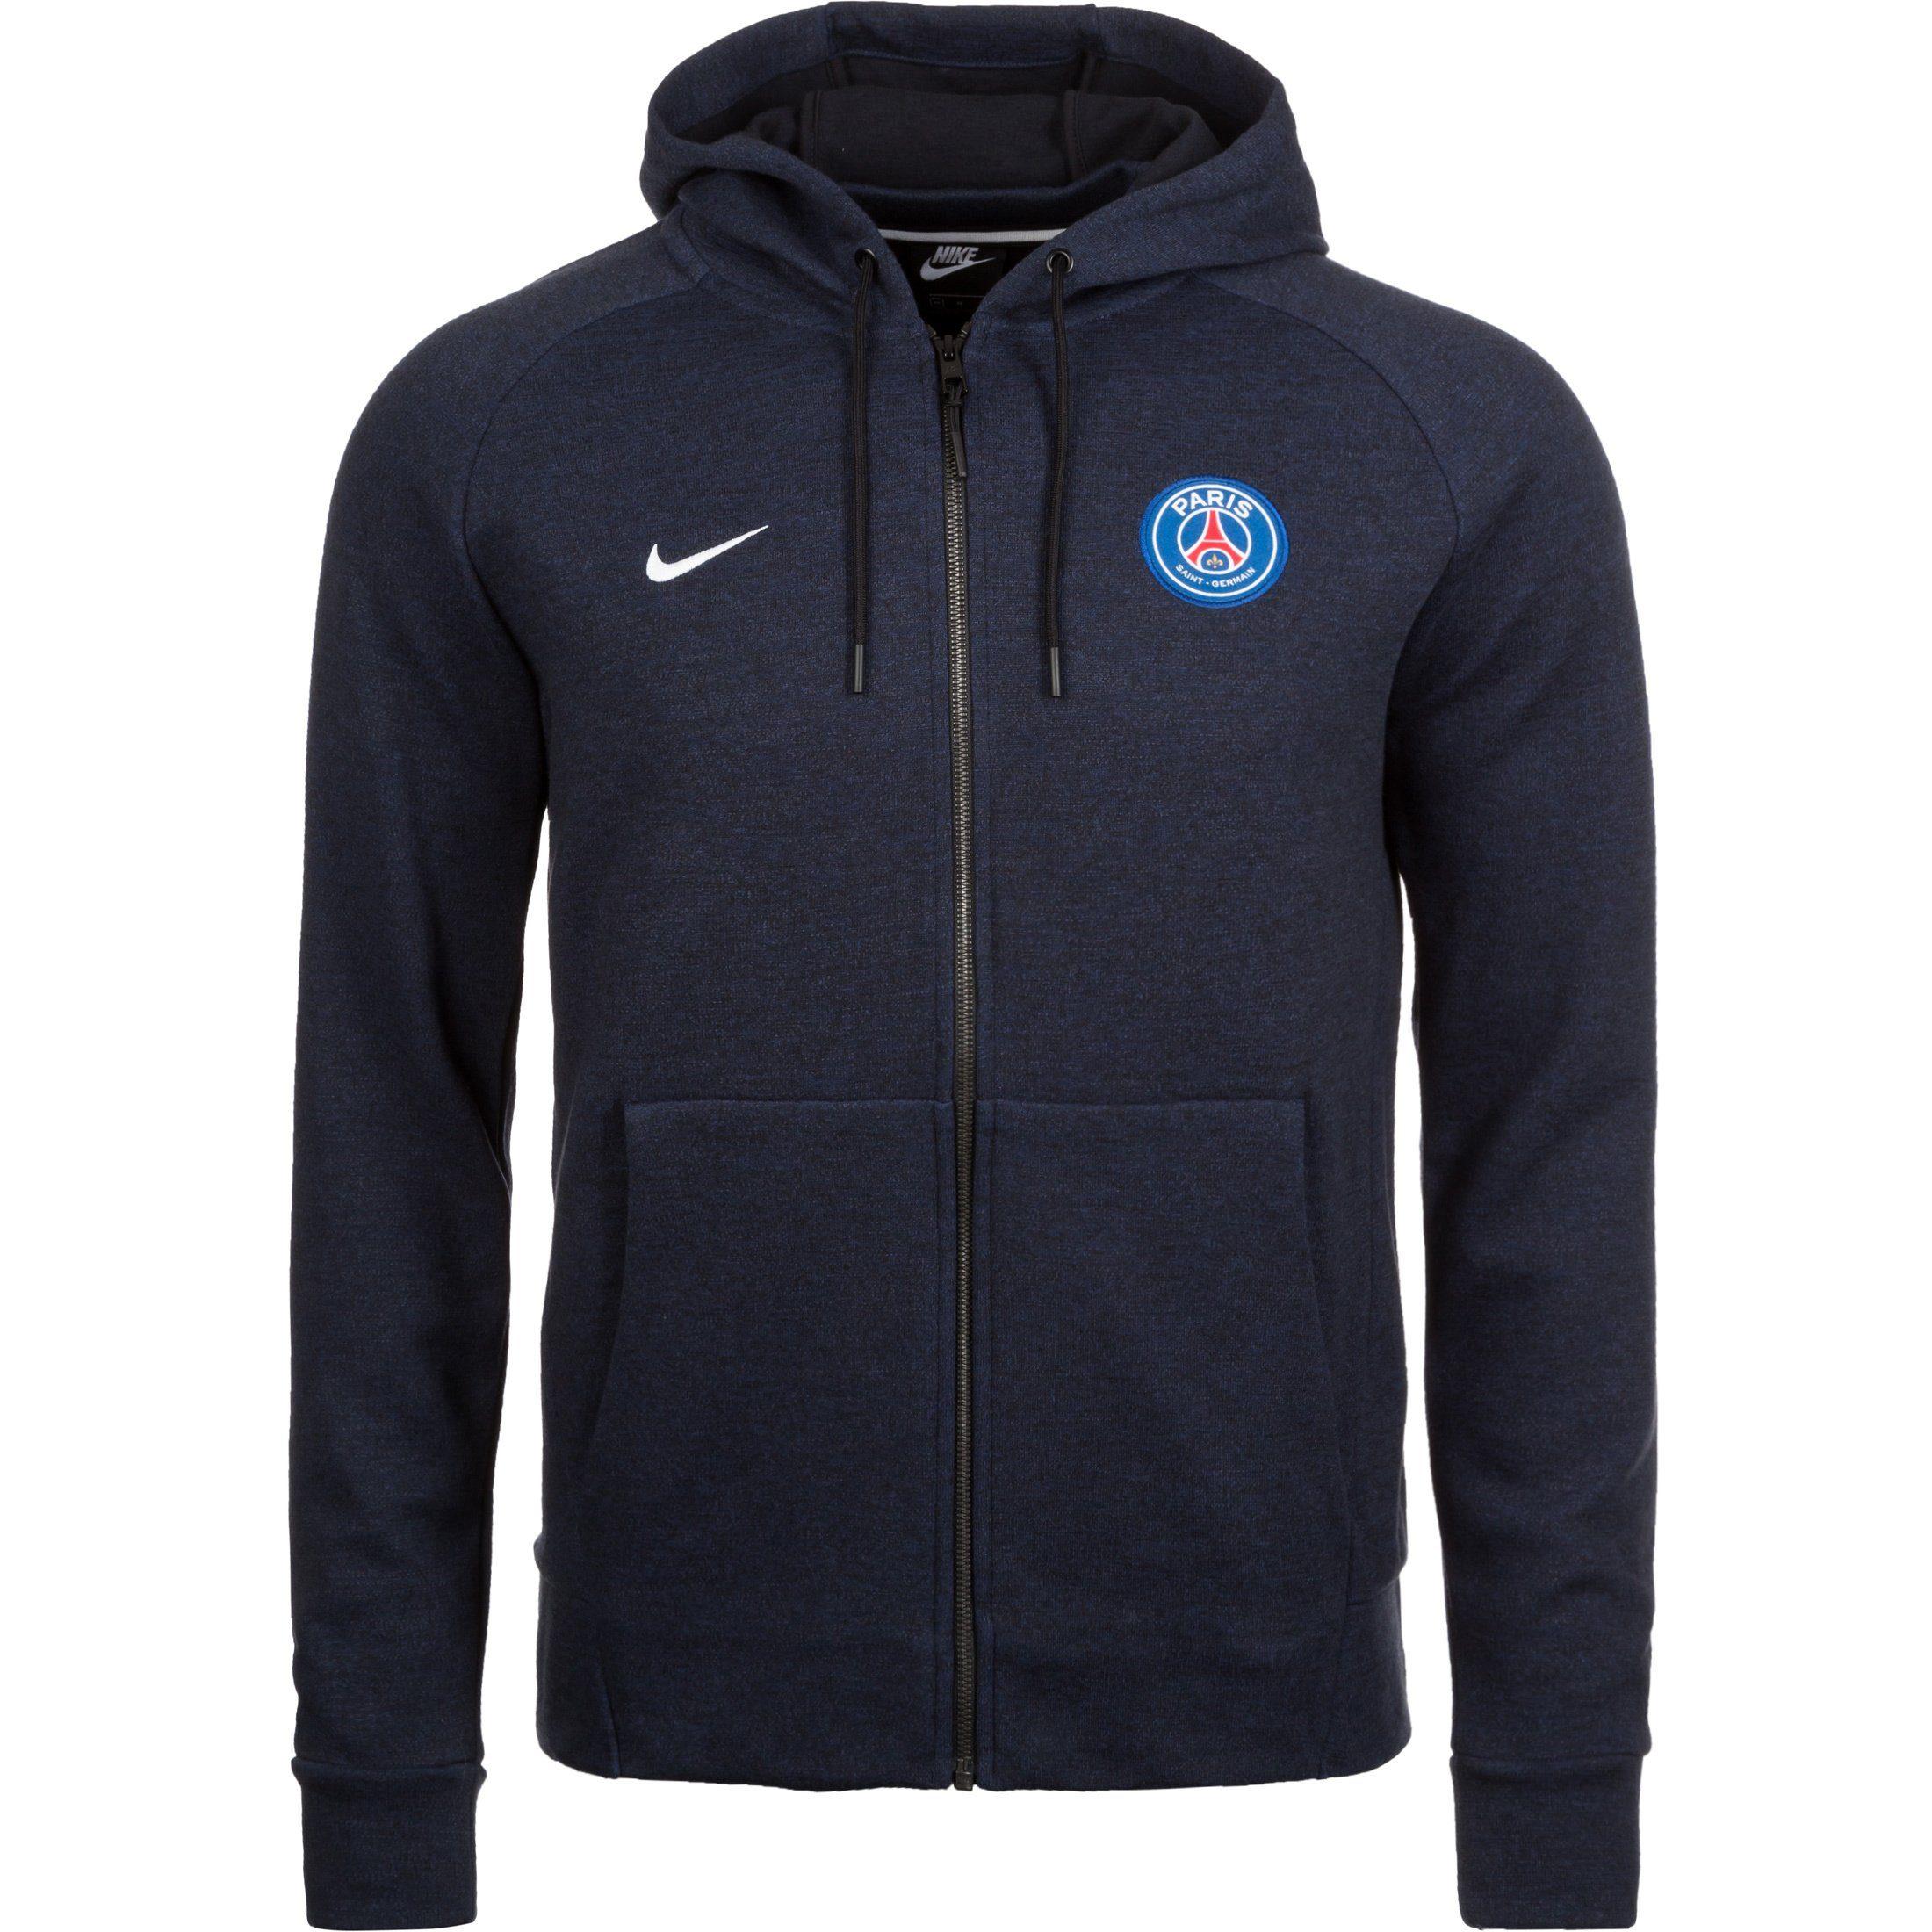 Nike Sportswear Kapuzensweatjacke Paris Saint-germain Optic Preisvergleich